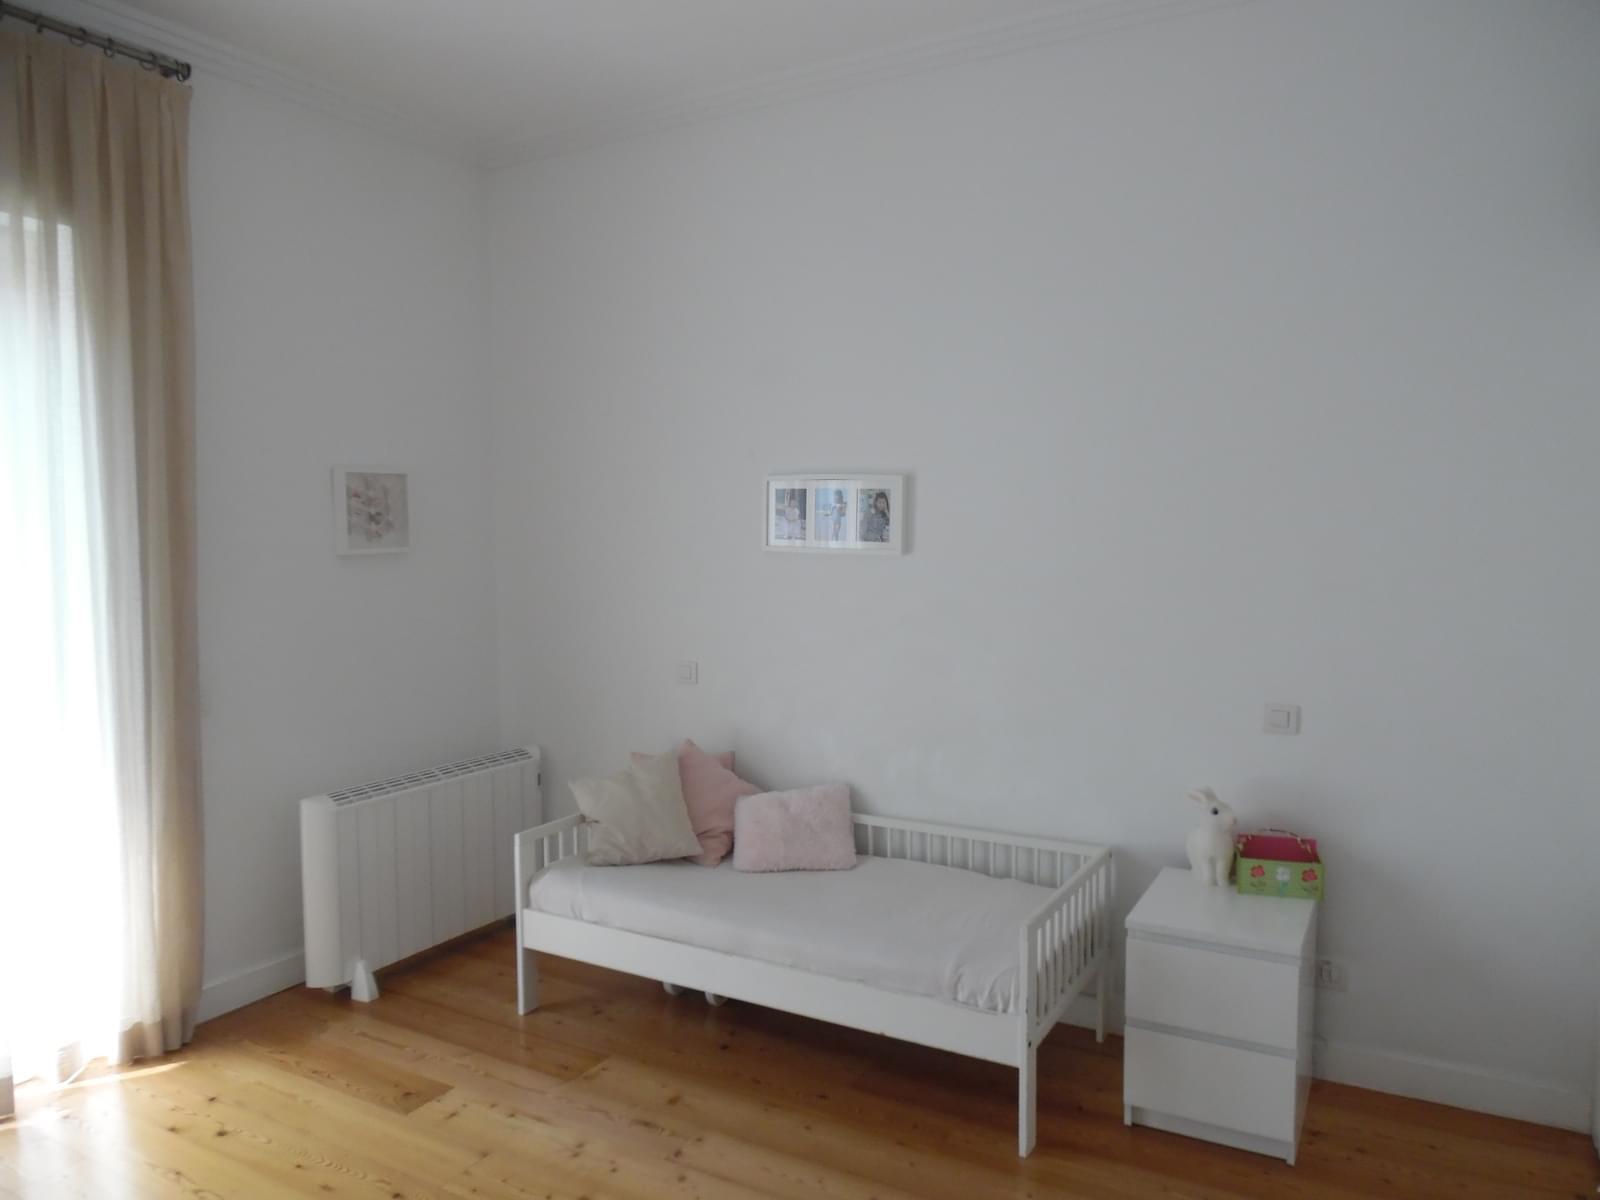 pf17454-apartamento-t4-lisboa-97158596-32f8-4f1e-8119-b443fe466504